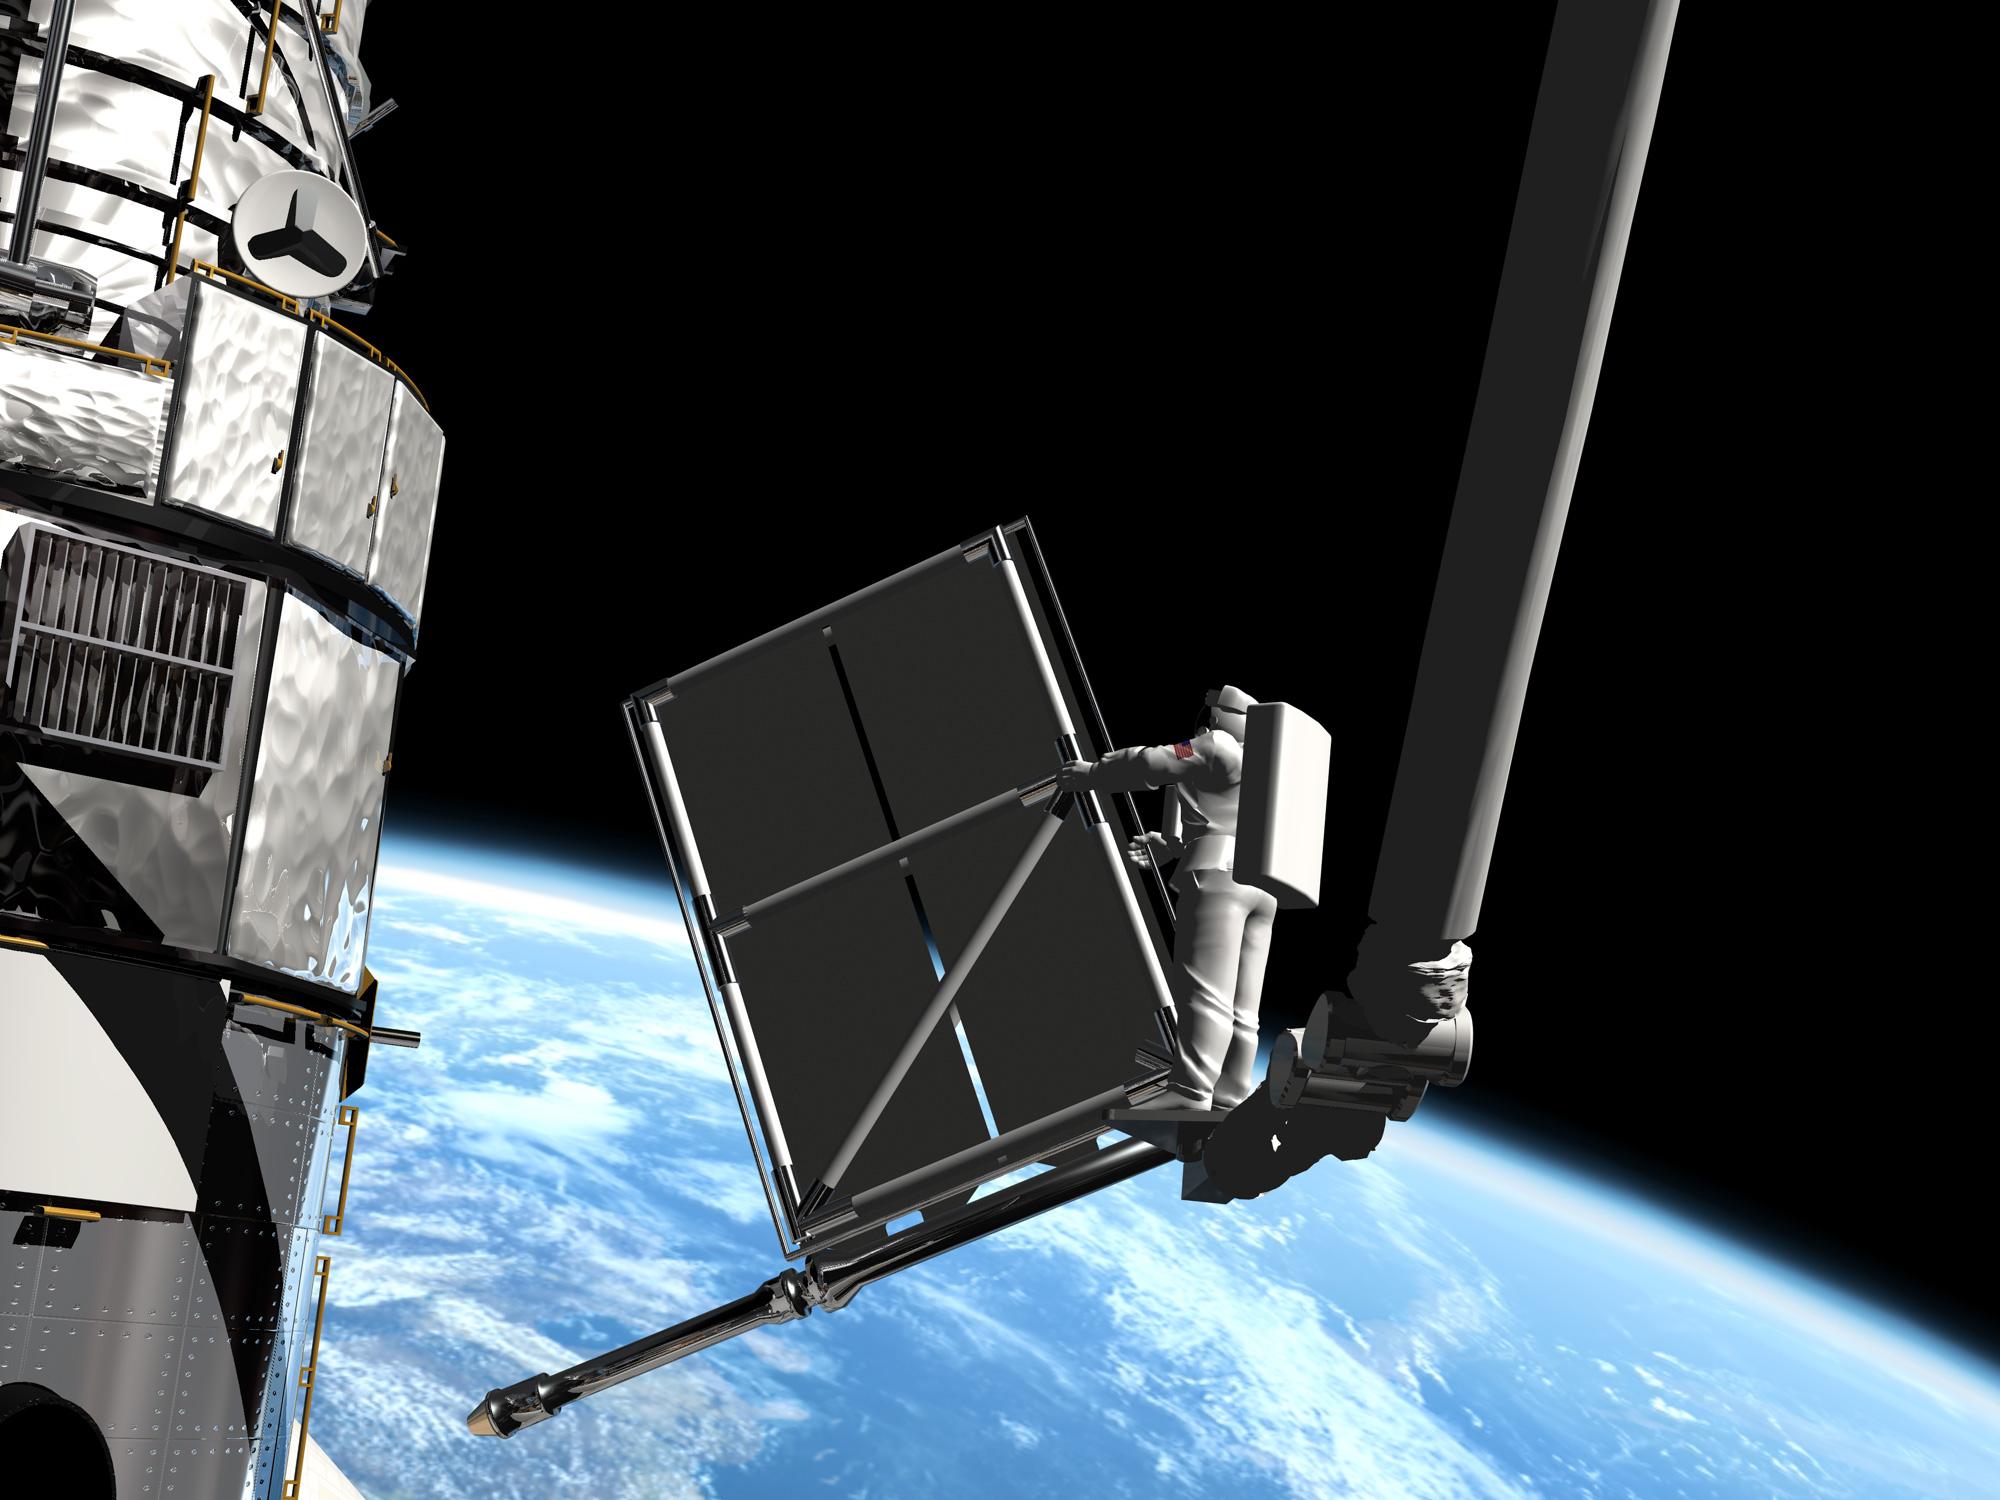 ranger spacecraft solar panels - photo #10